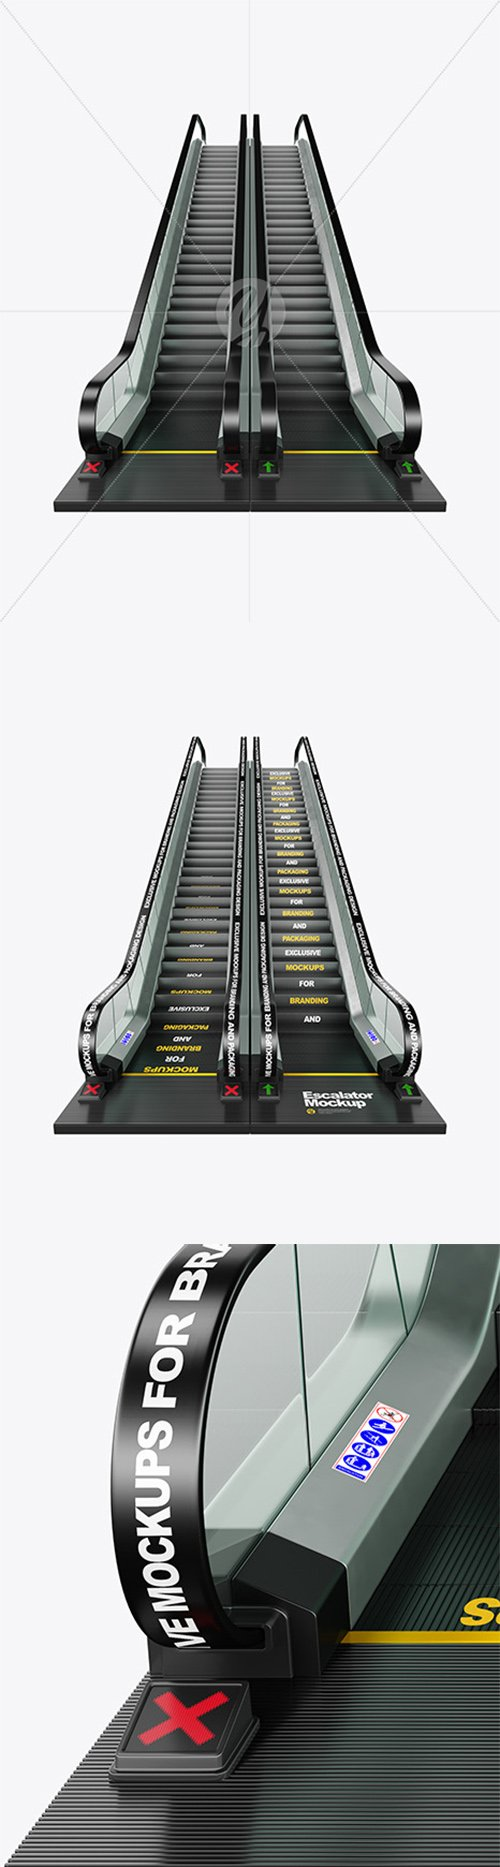 Double Escalator Mockup 66591 TIF